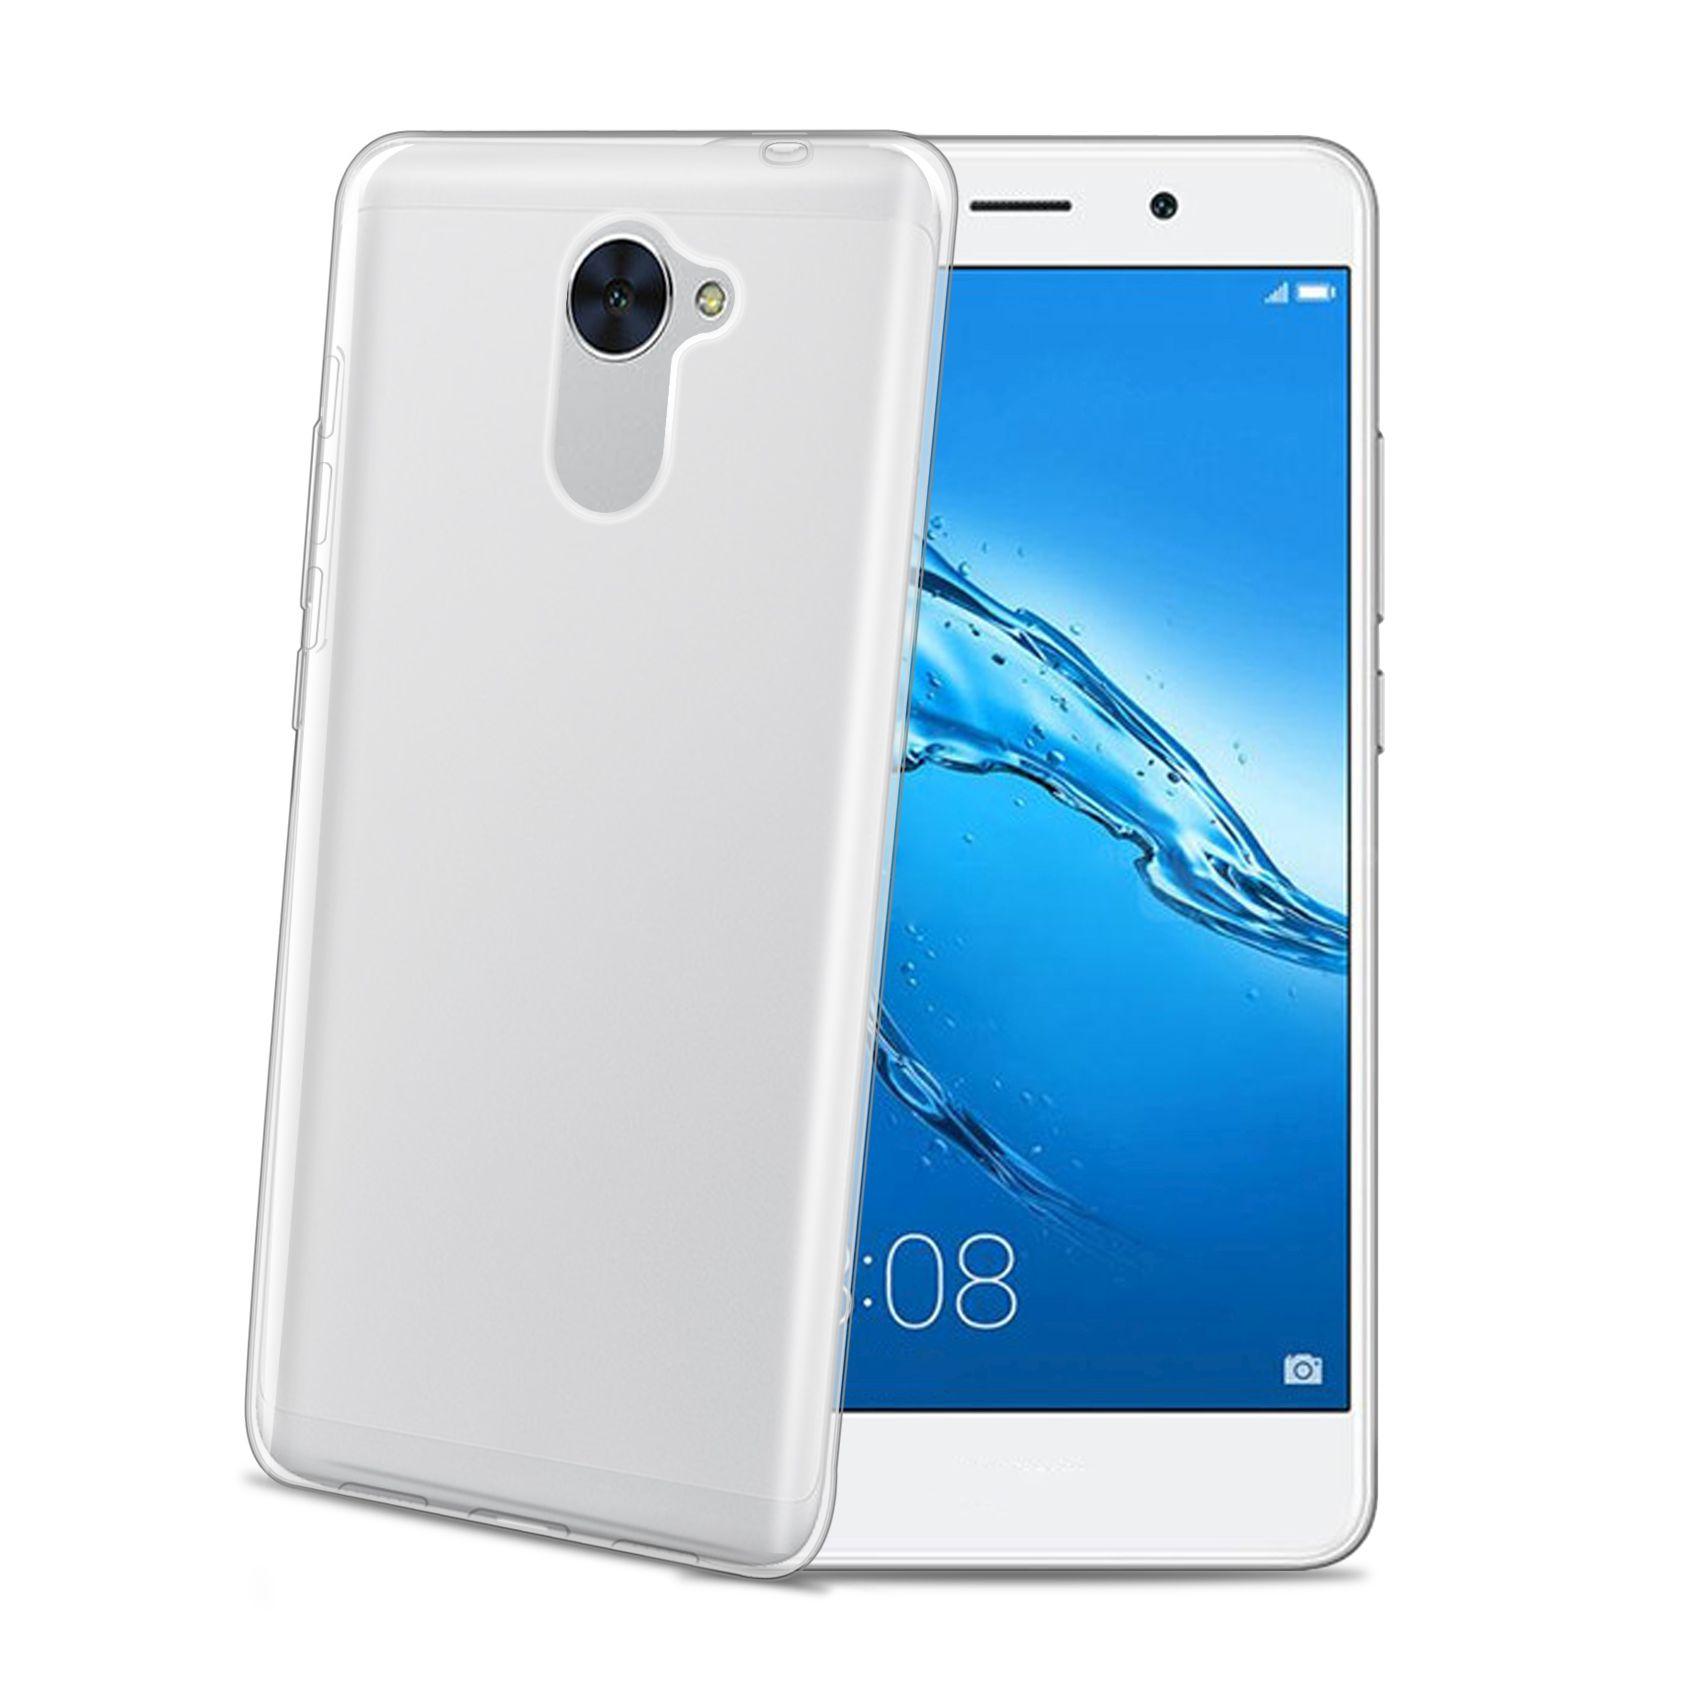 TPU pouzdro CELLY Gelskin pro Huawei Y7 / Nova Lite+, bezbarvé